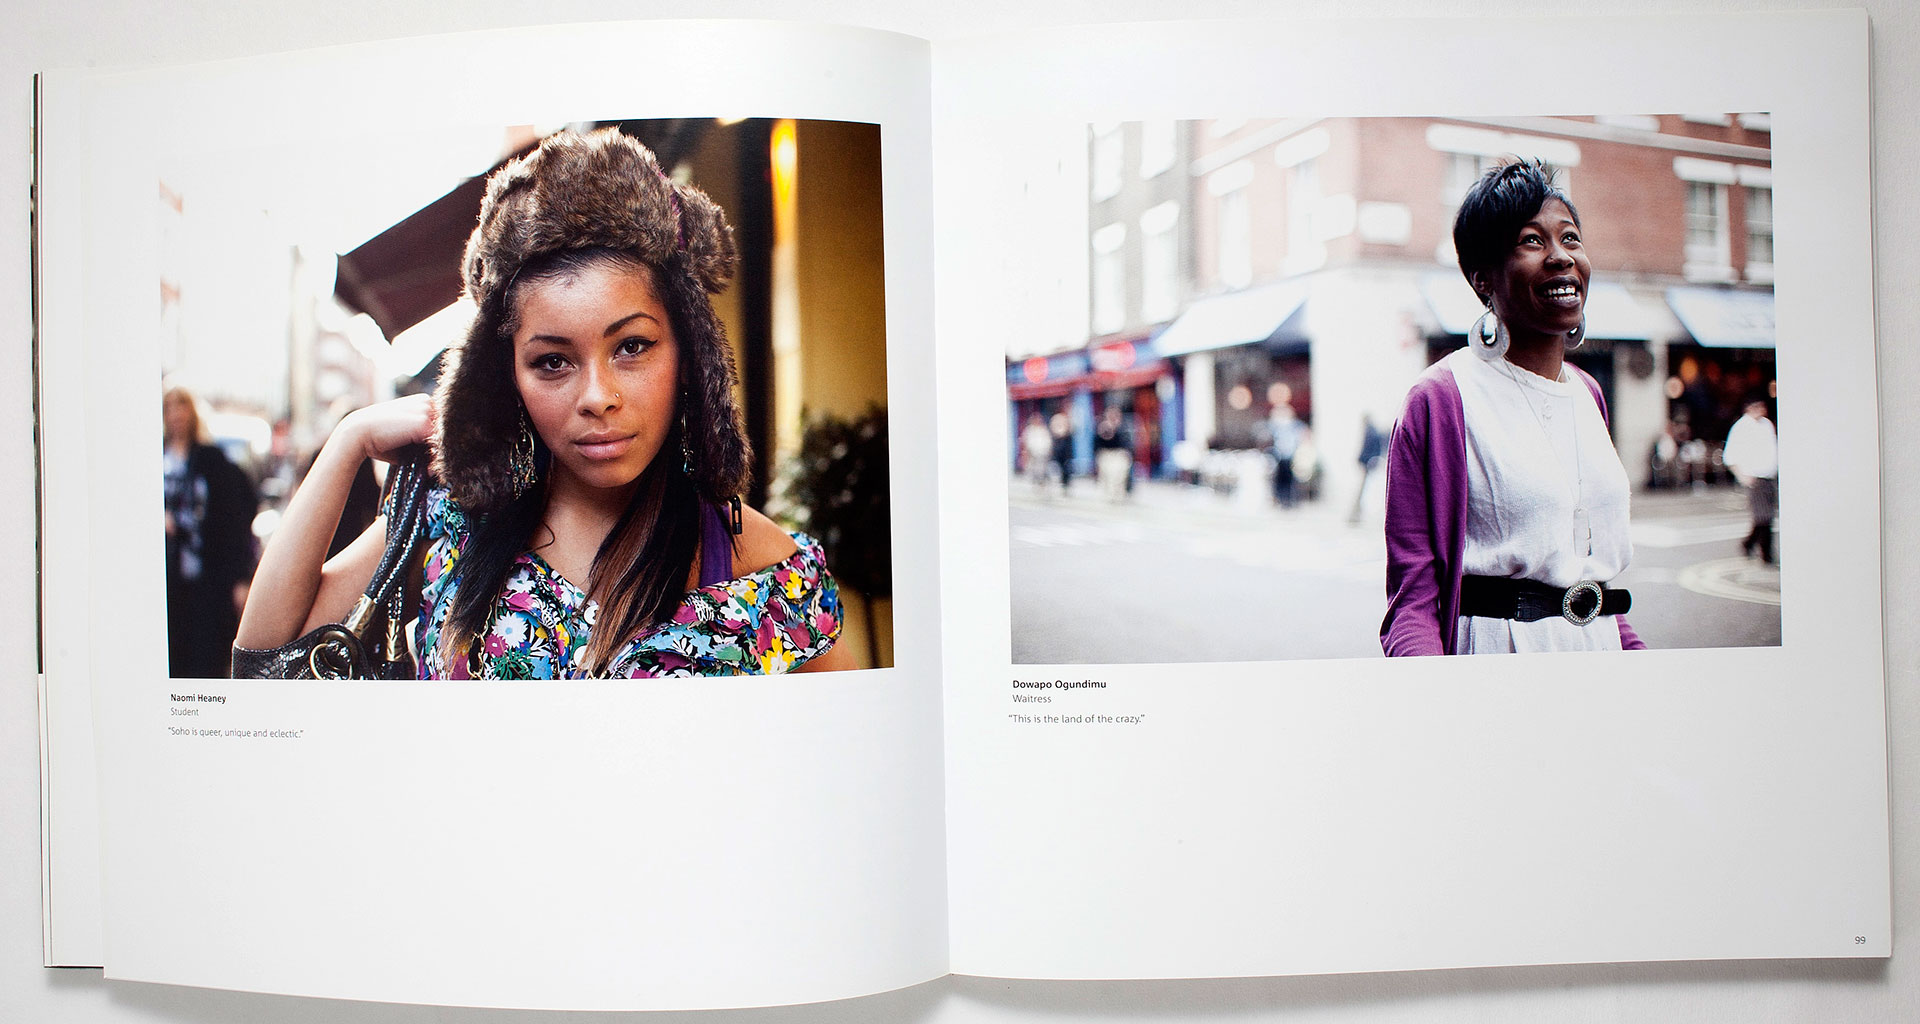 epm-print-management-bristol-photography-books-soho-lives-5.jpg